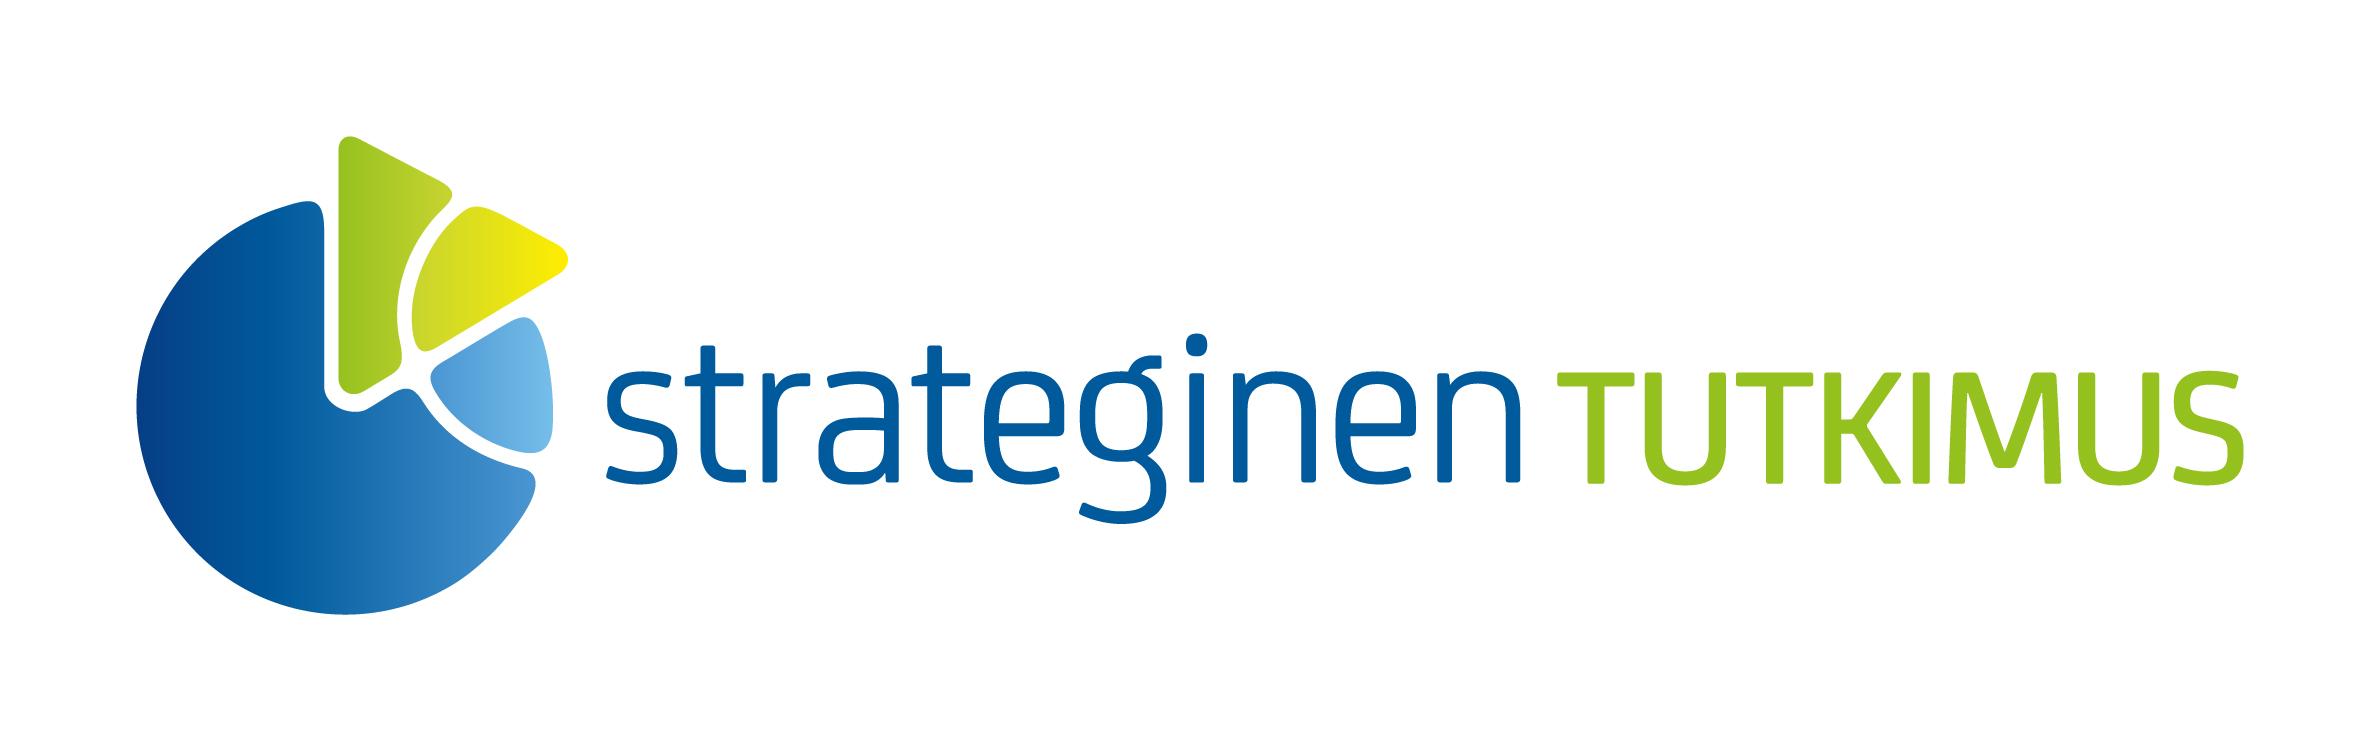 Strategisen tutkimuksen neuvoston logo.